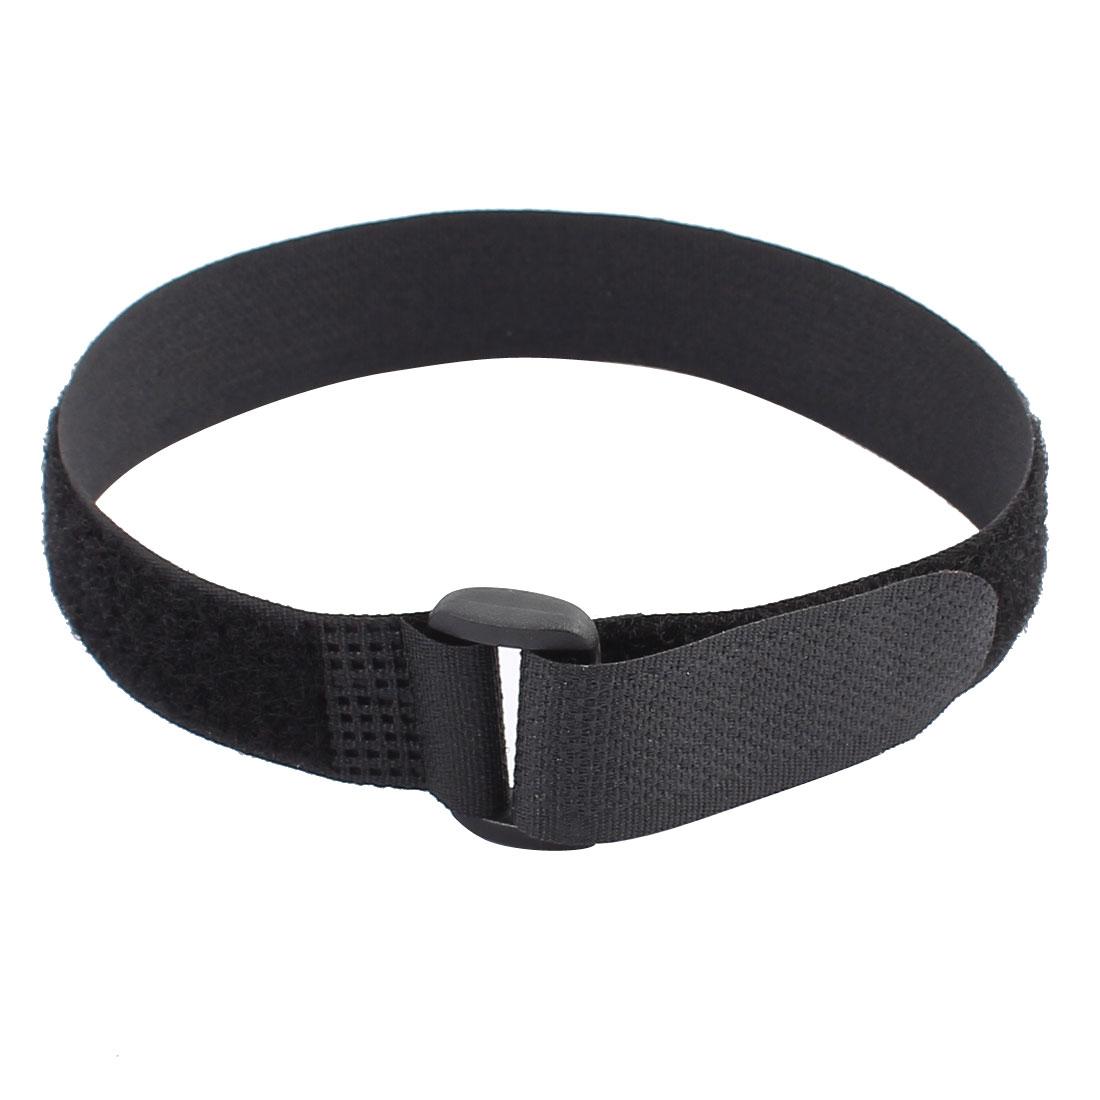 35cm Length 20mm Width Nylon Detachable Fastener Loop Tie Strap Belt Black